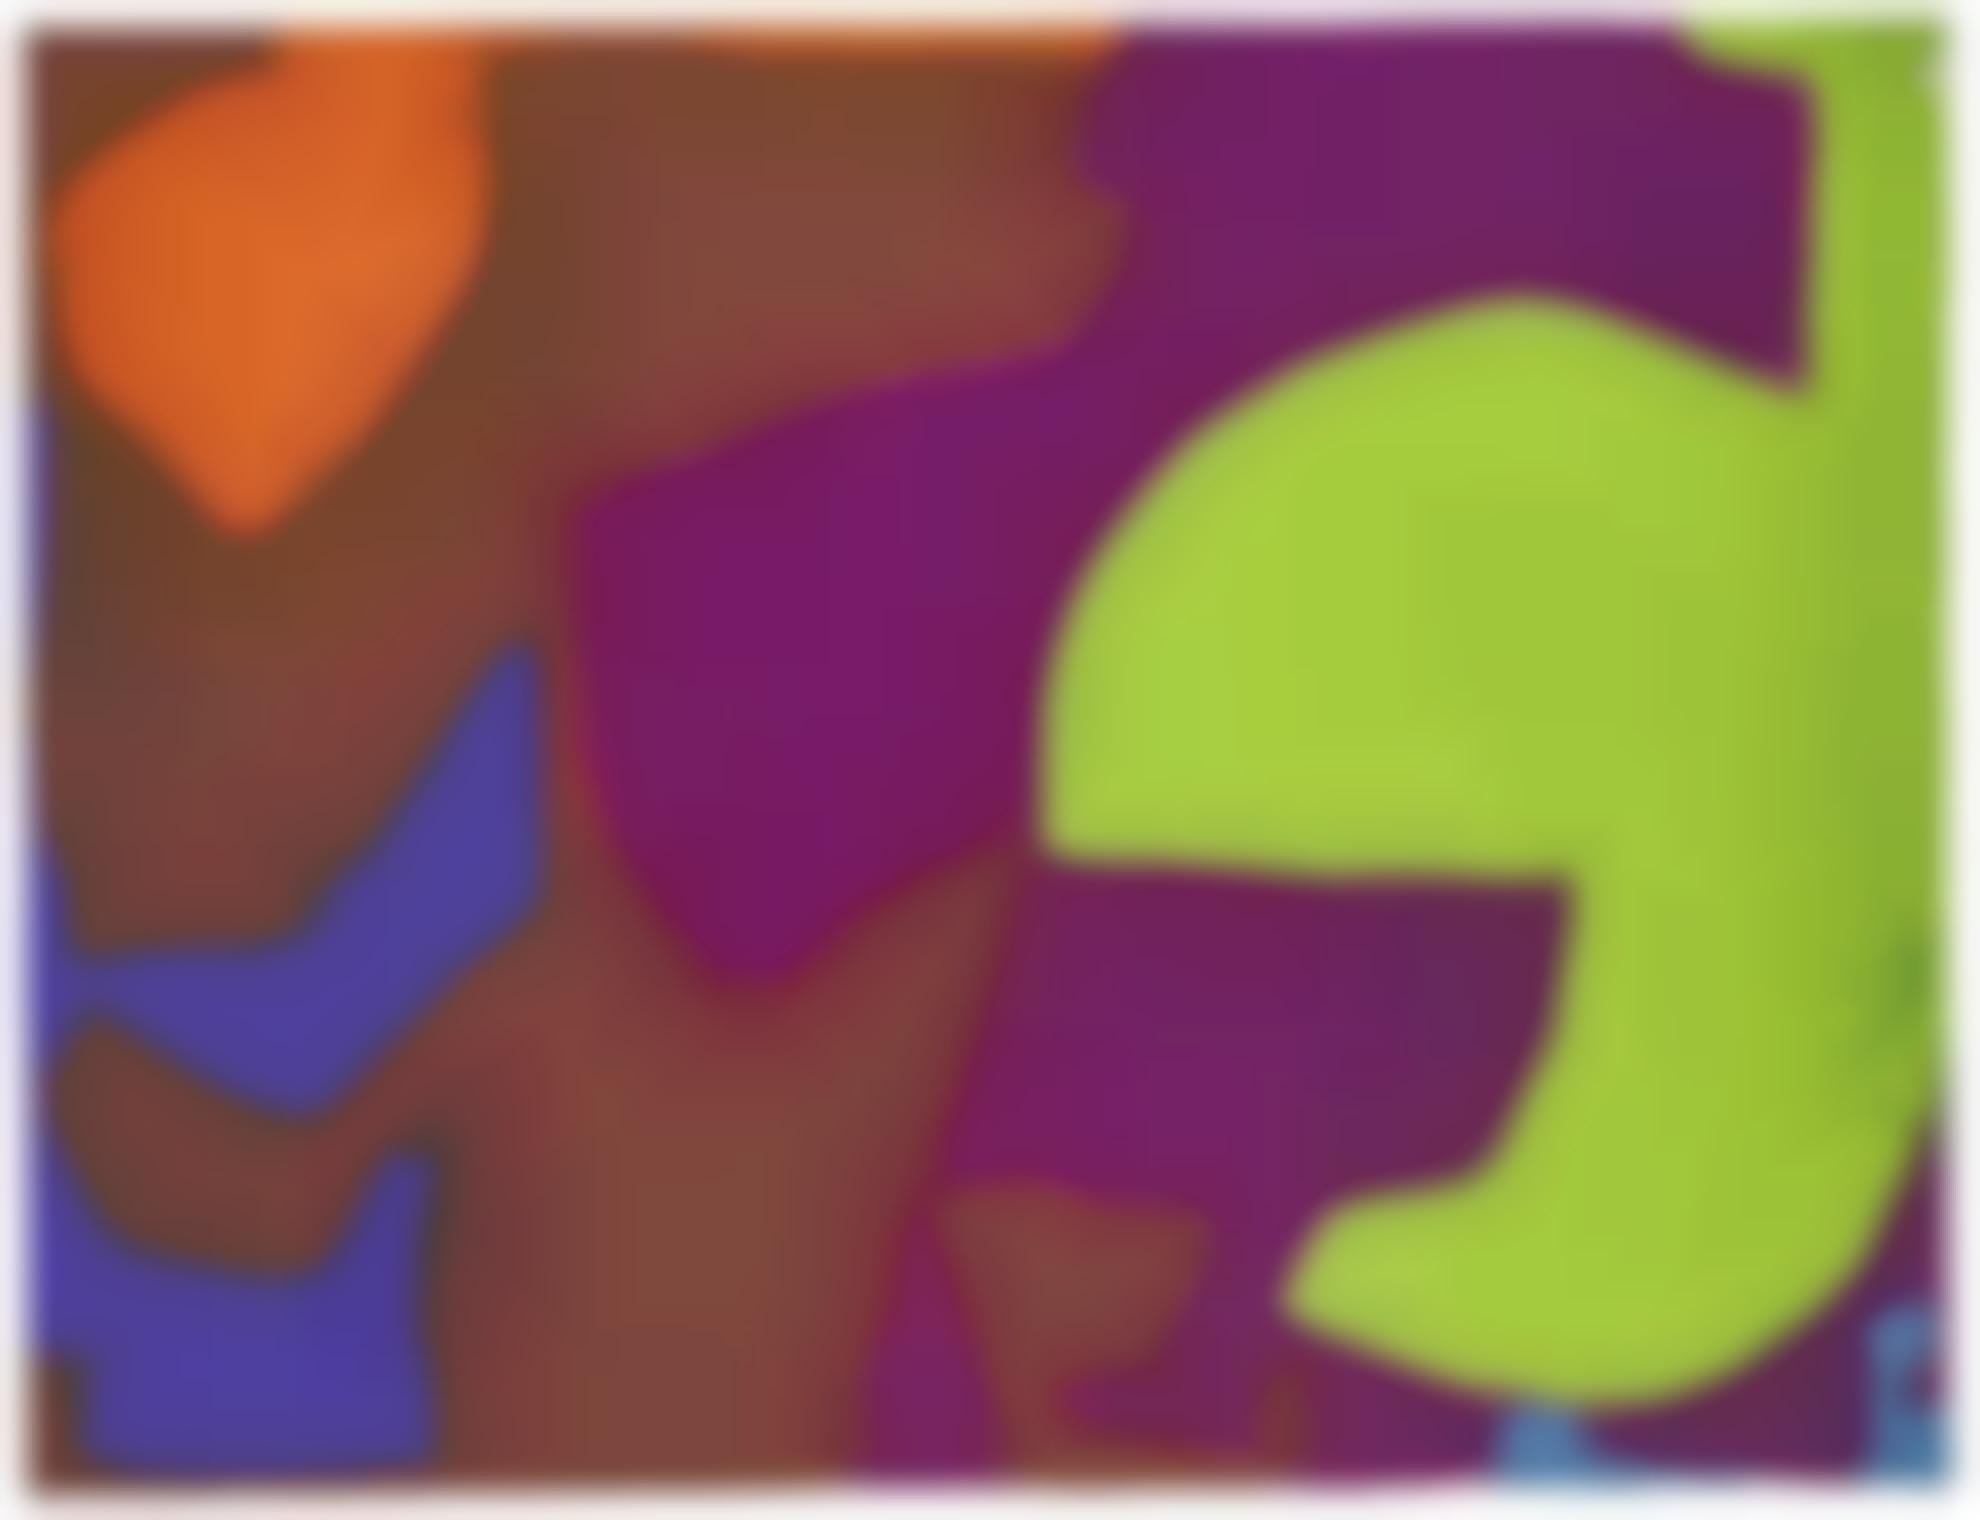 Patrick Heron-Emerald, Violet, Brown, Blue, Orange: February - January 1971-